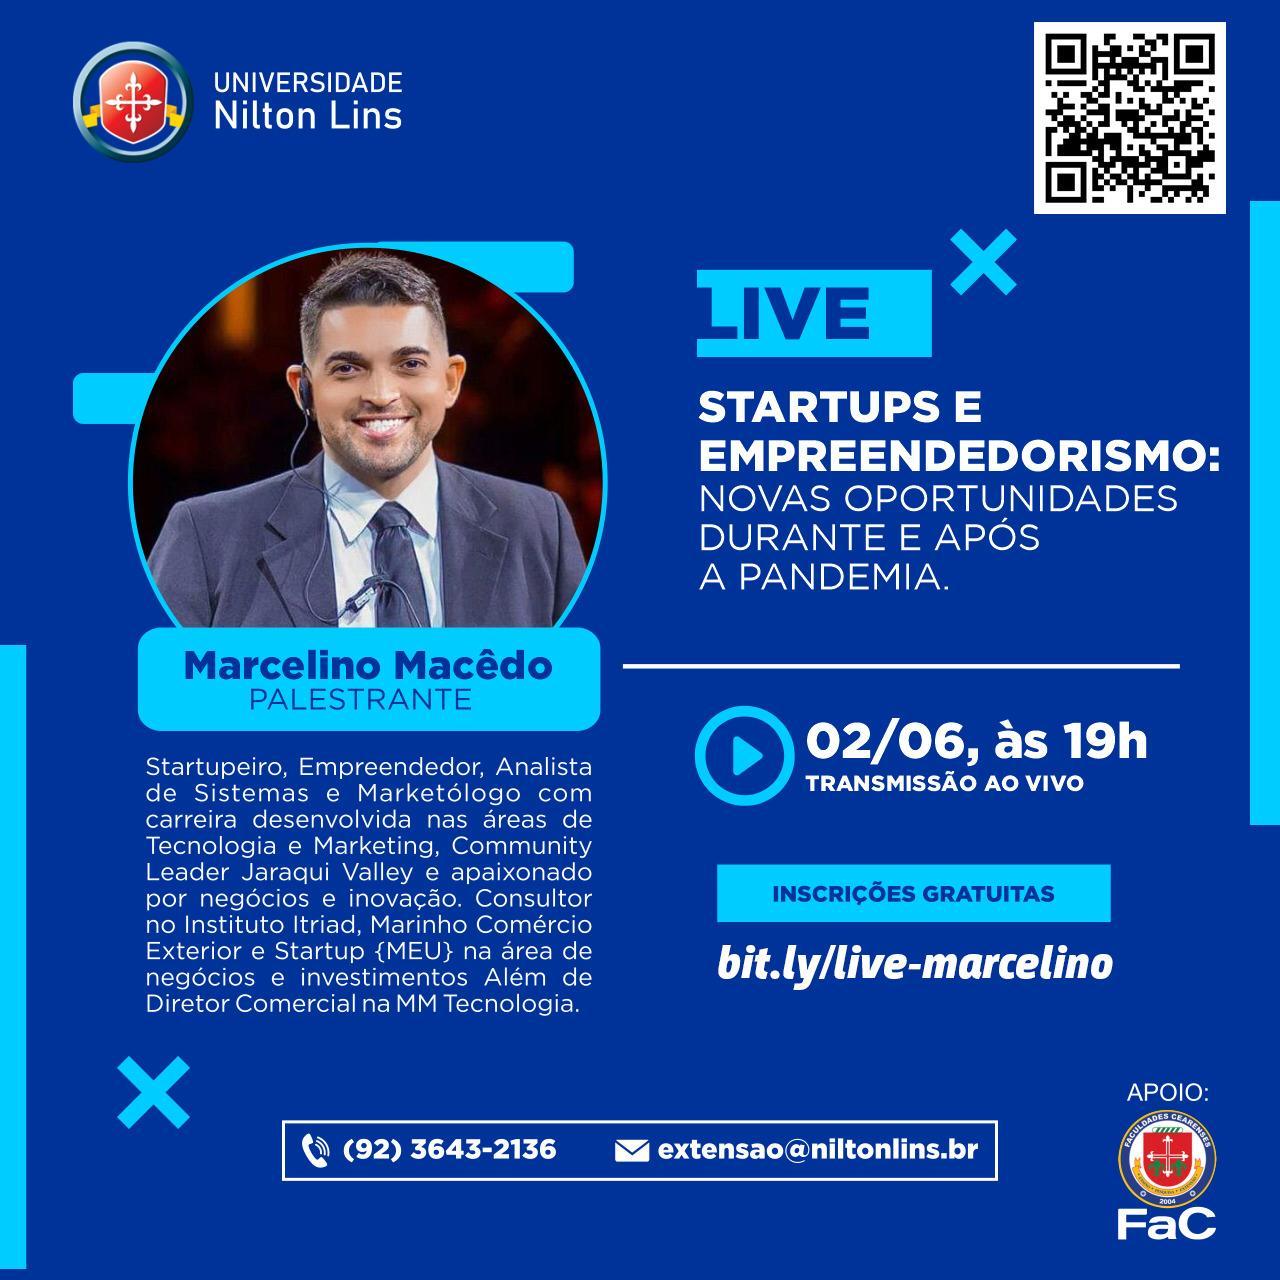 Universidade Nilton Lins Promove Live sobre Startups e Empreendedorismo.